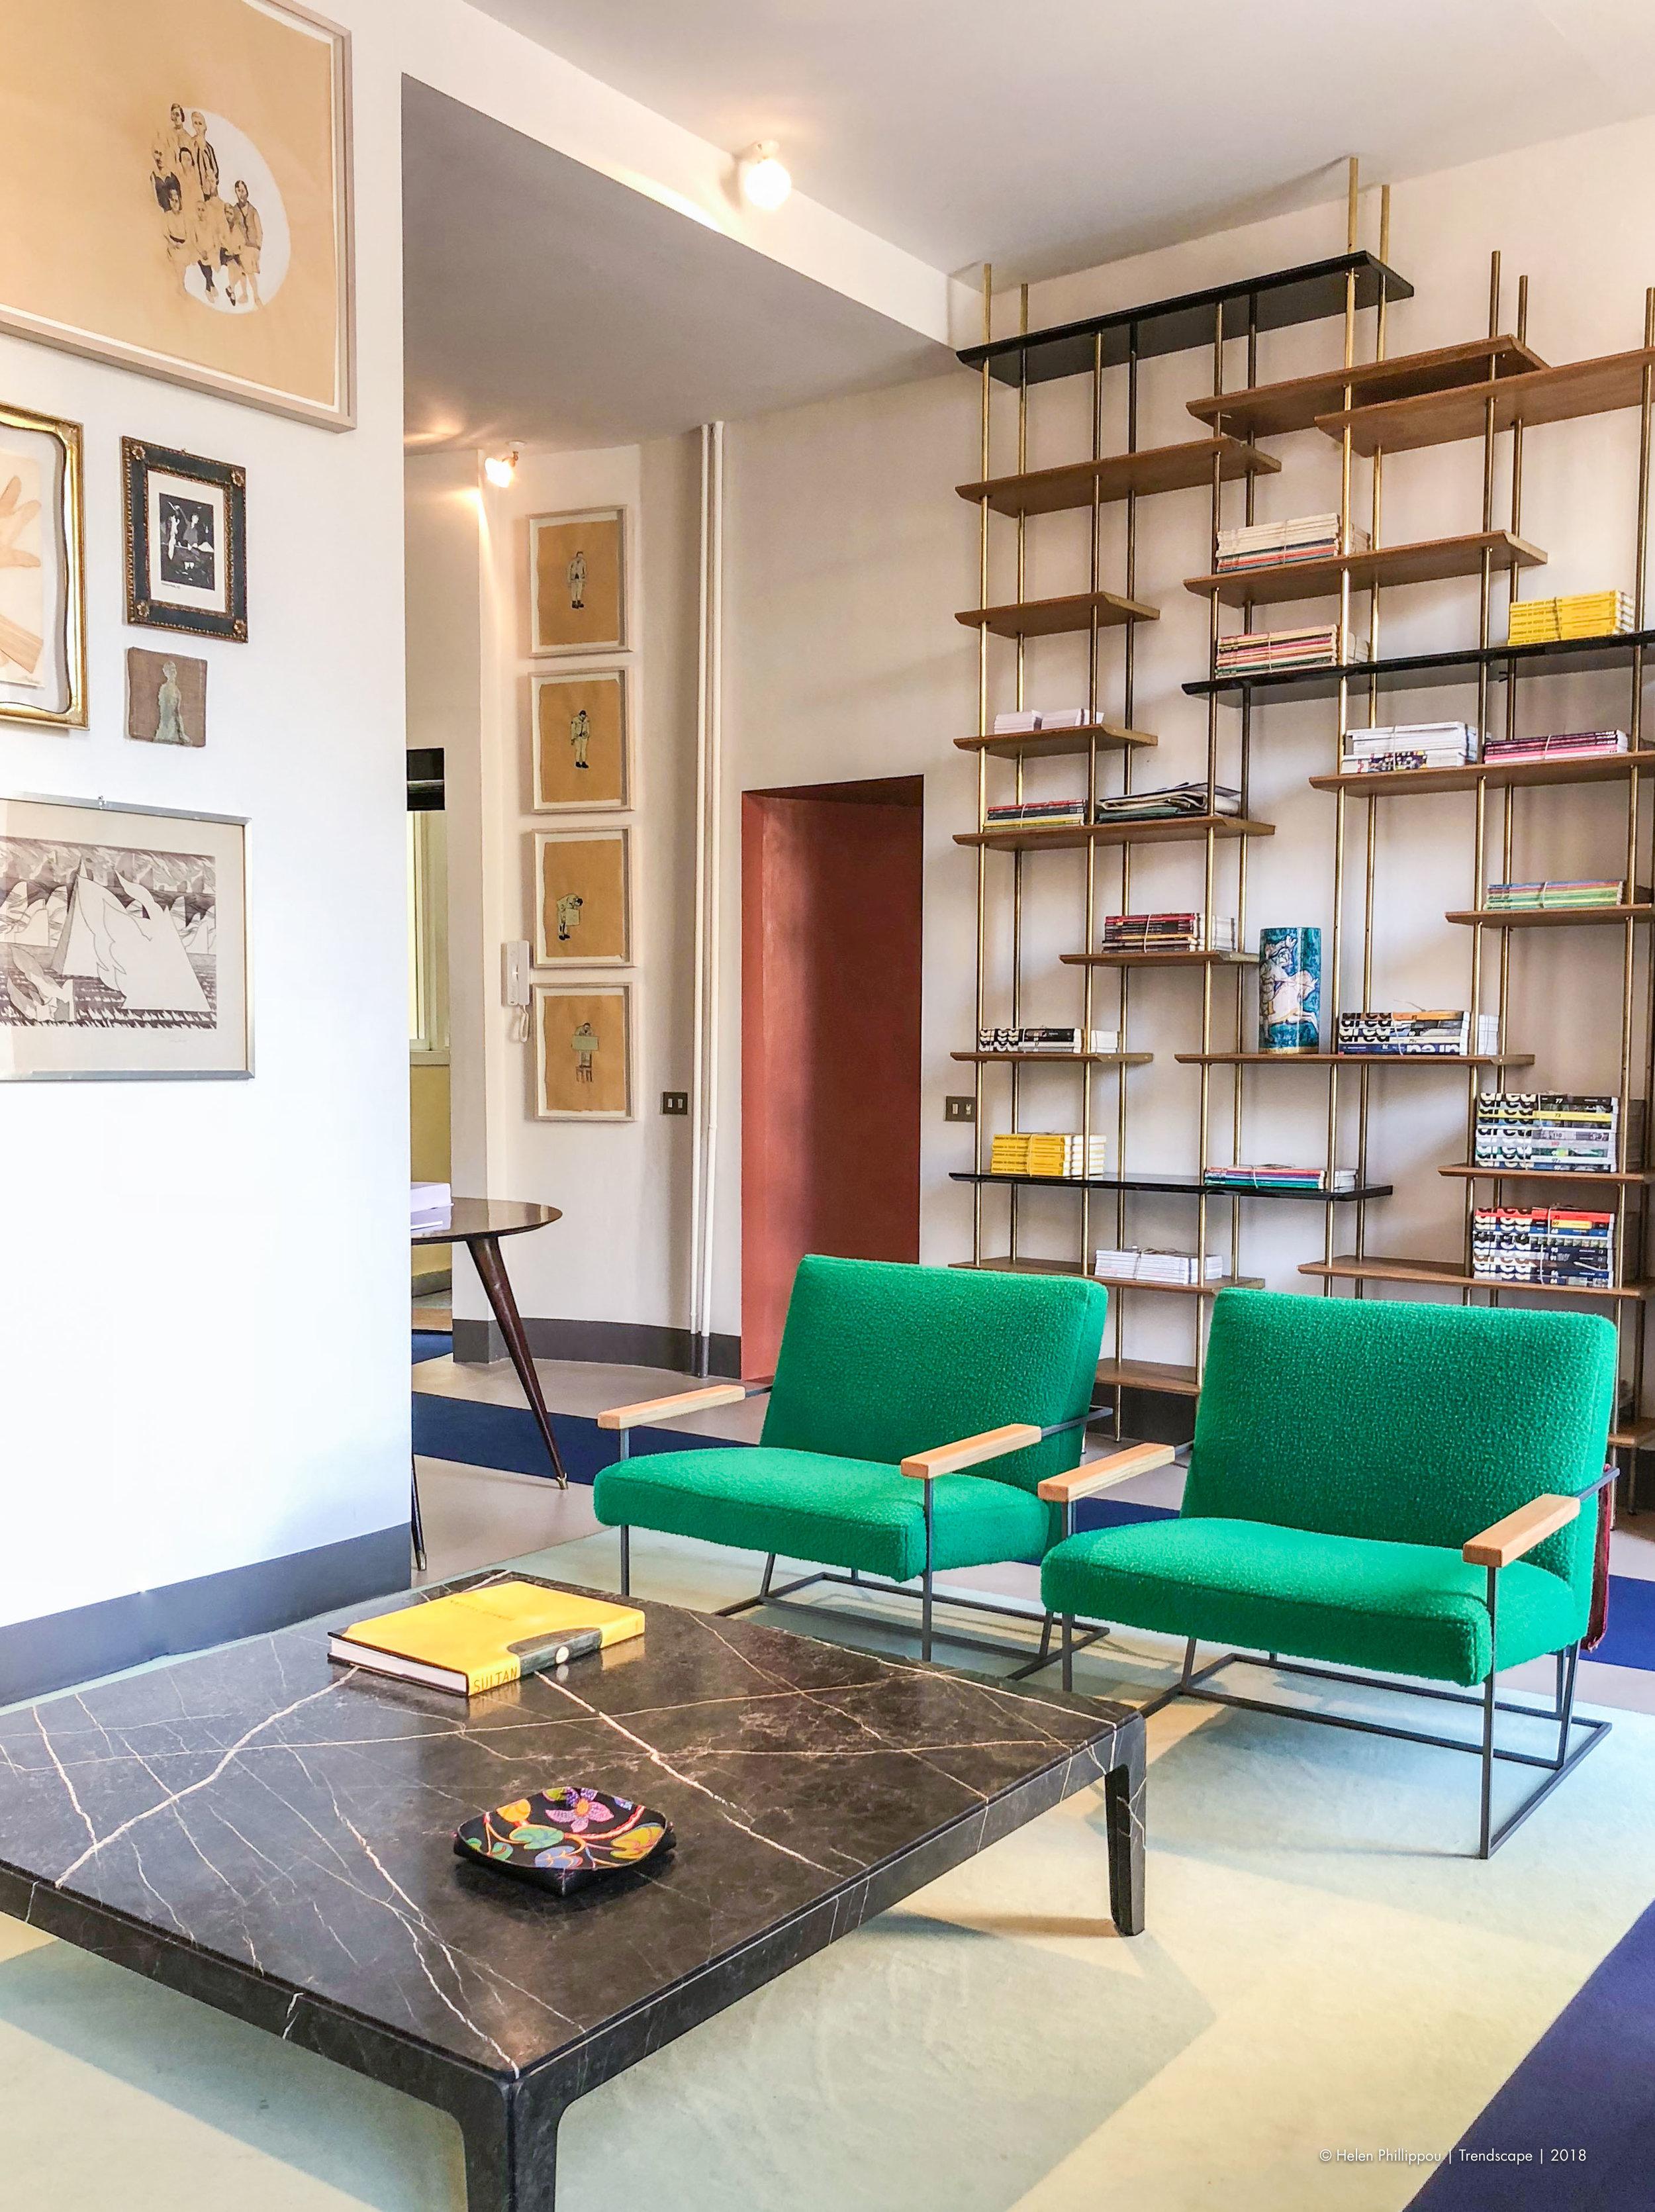 Giovanni Cagnato Milan Design Week 2018 1.jpg